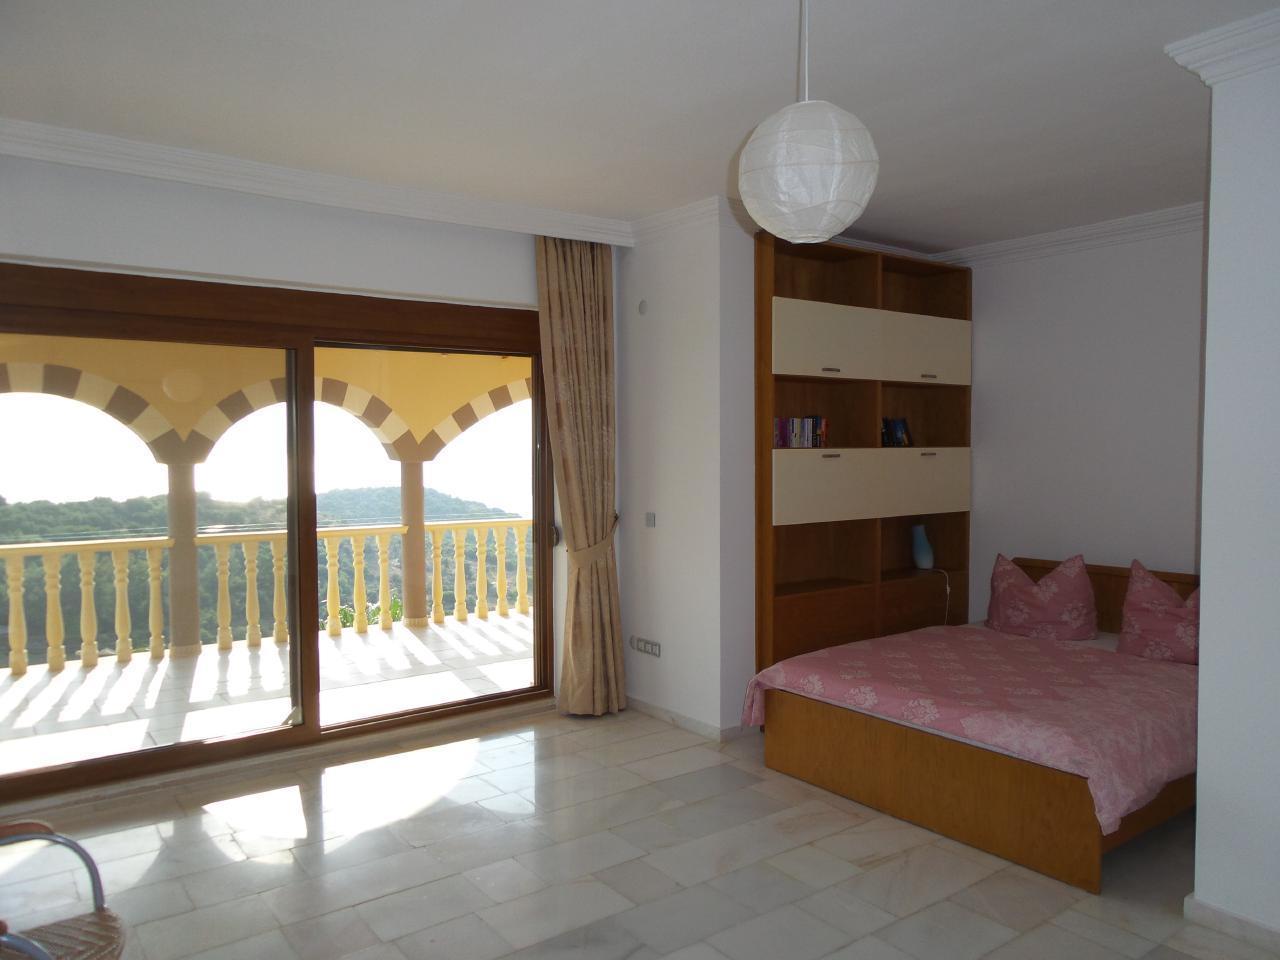 Ferienhaus Villa Gazipasa/Alanya-Gazipasa 200 Meter vom Meer (728528), Gazipasa, , Mittelmeerregion, Türkei, Bild 6